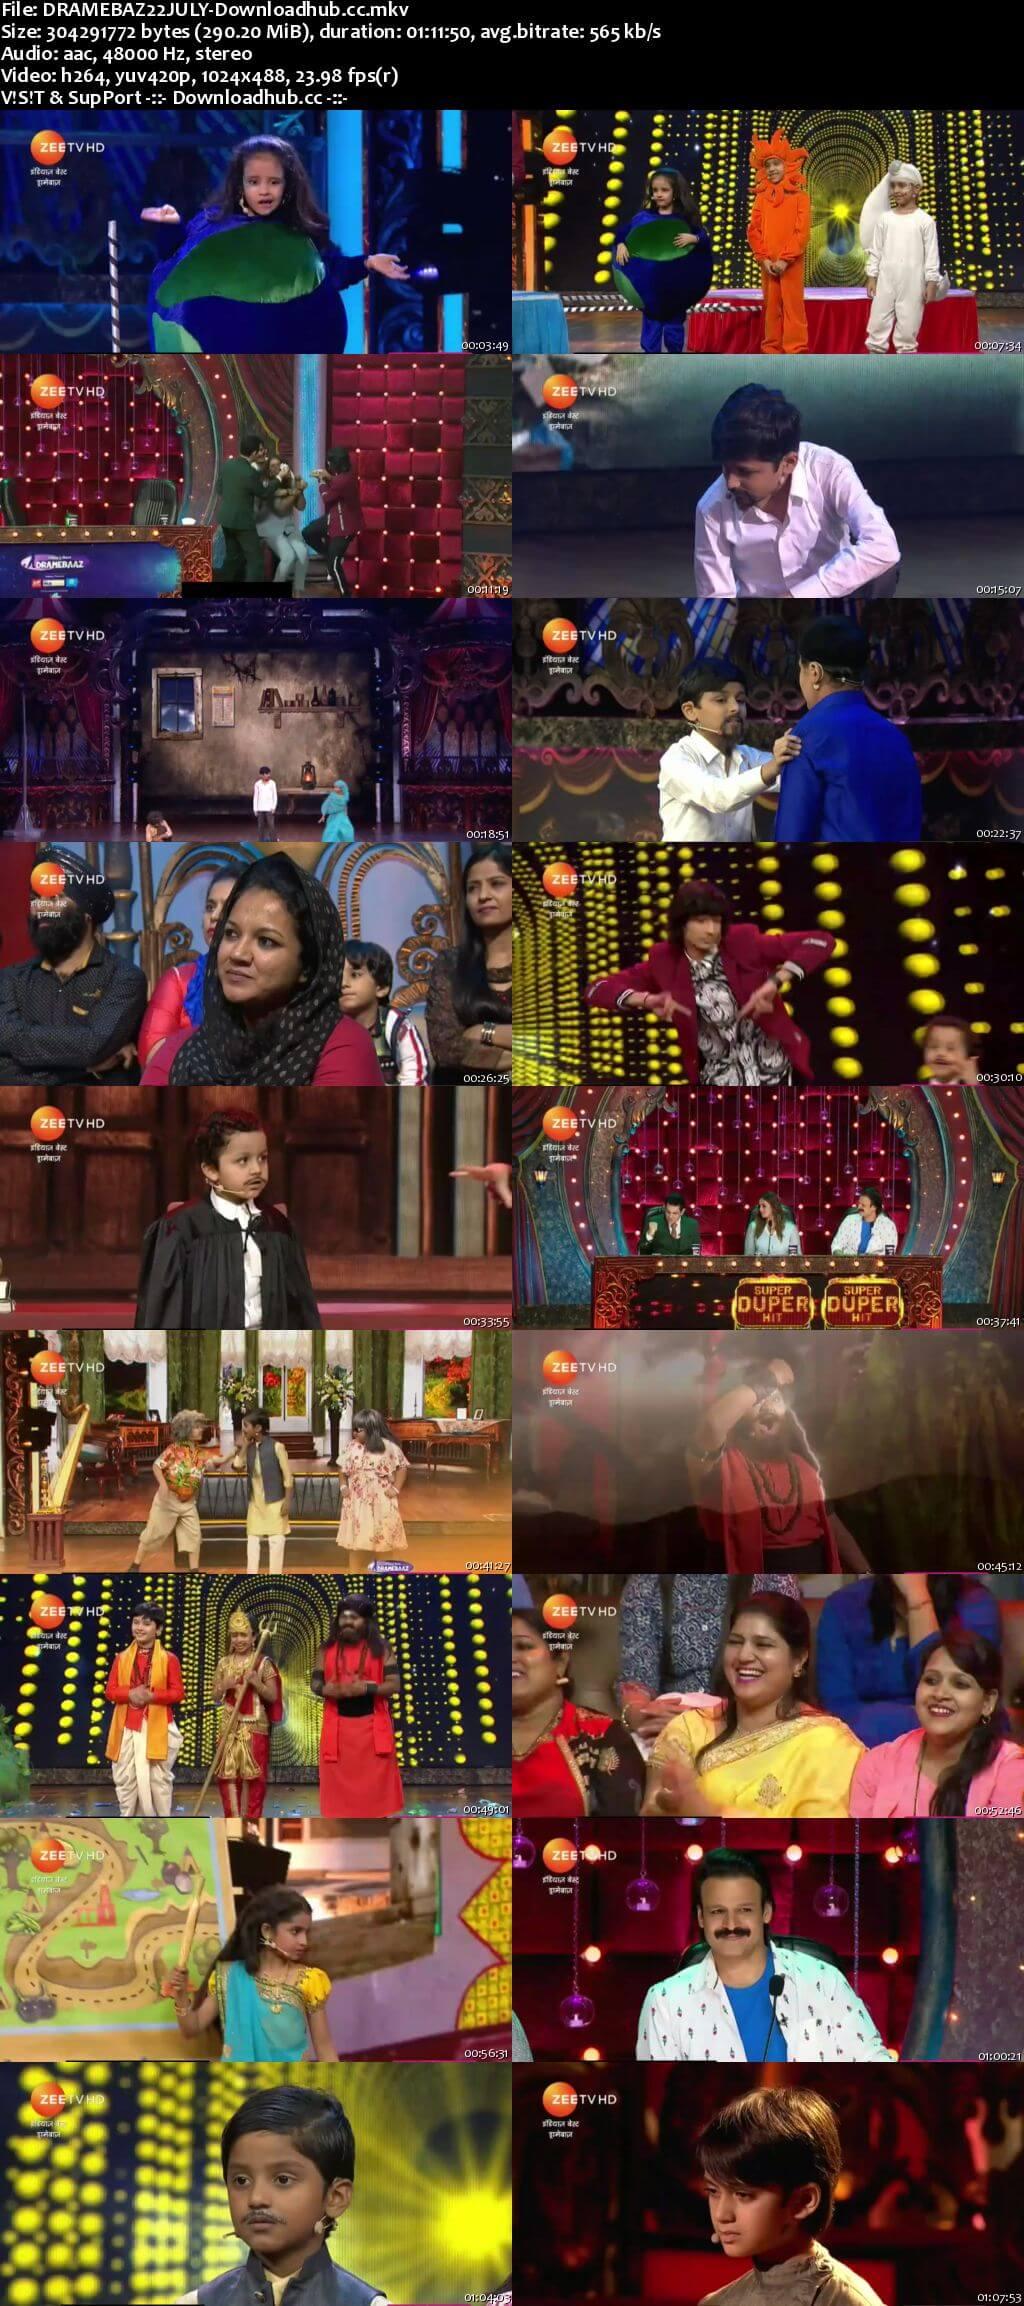 Indias Best Dramebaaz Season 3 22 July 2018 Episode 08 HDTV 480p